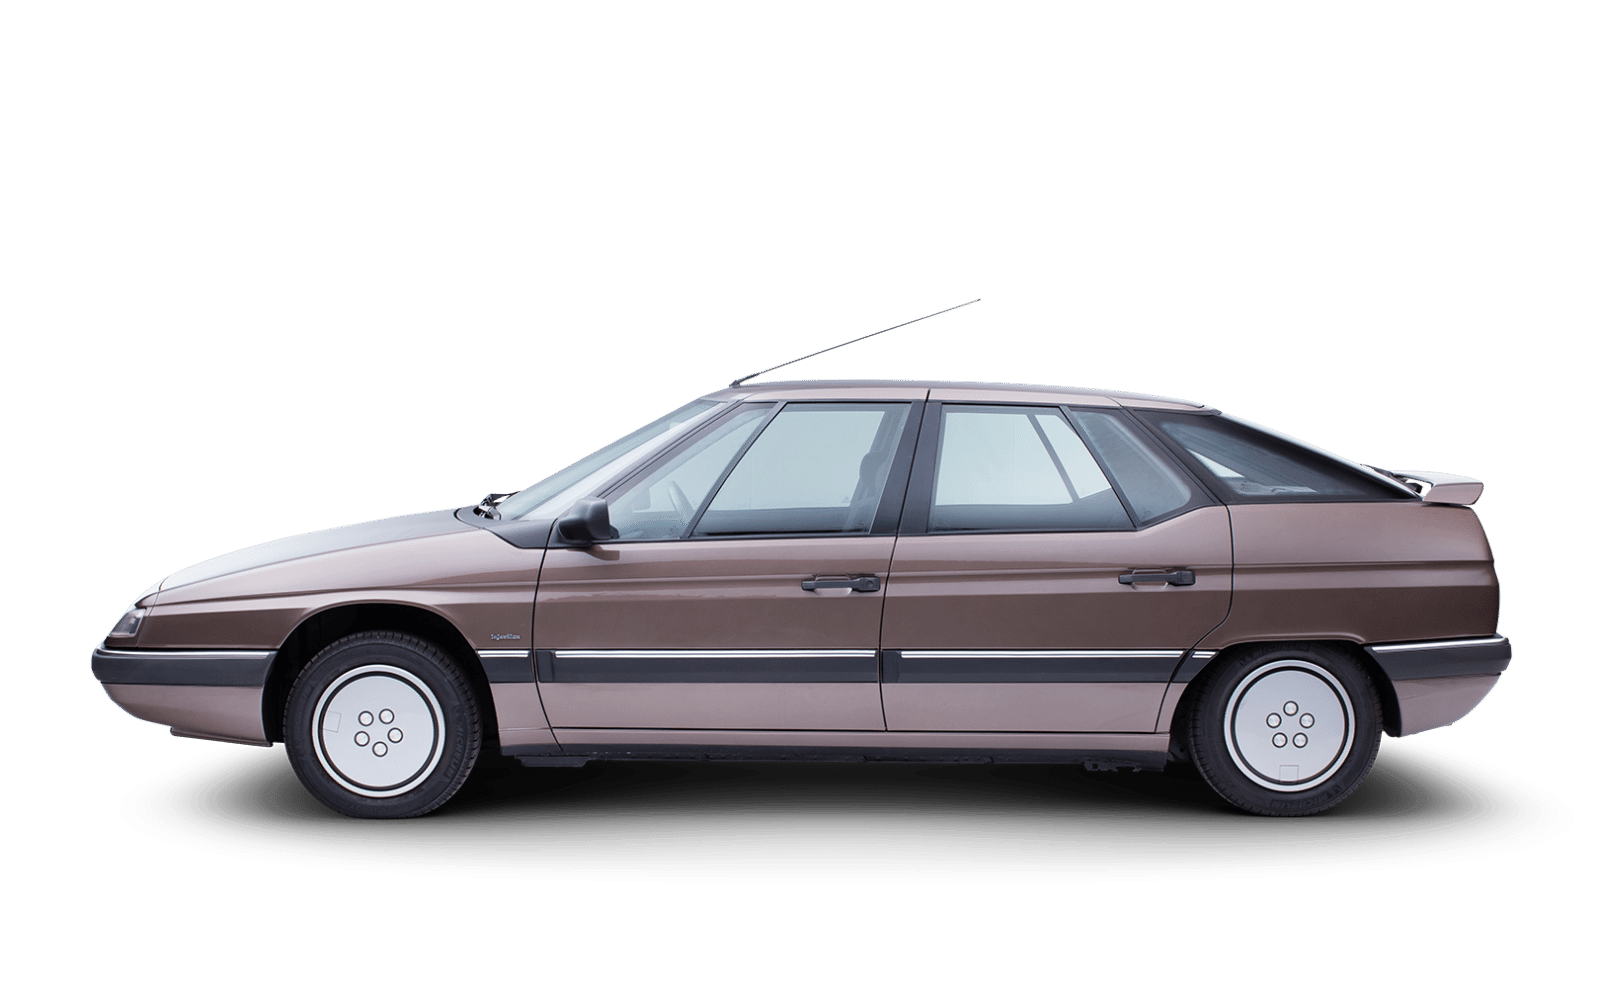 Citroen XM I 1989 - 1994 Station wagon 5 door #6